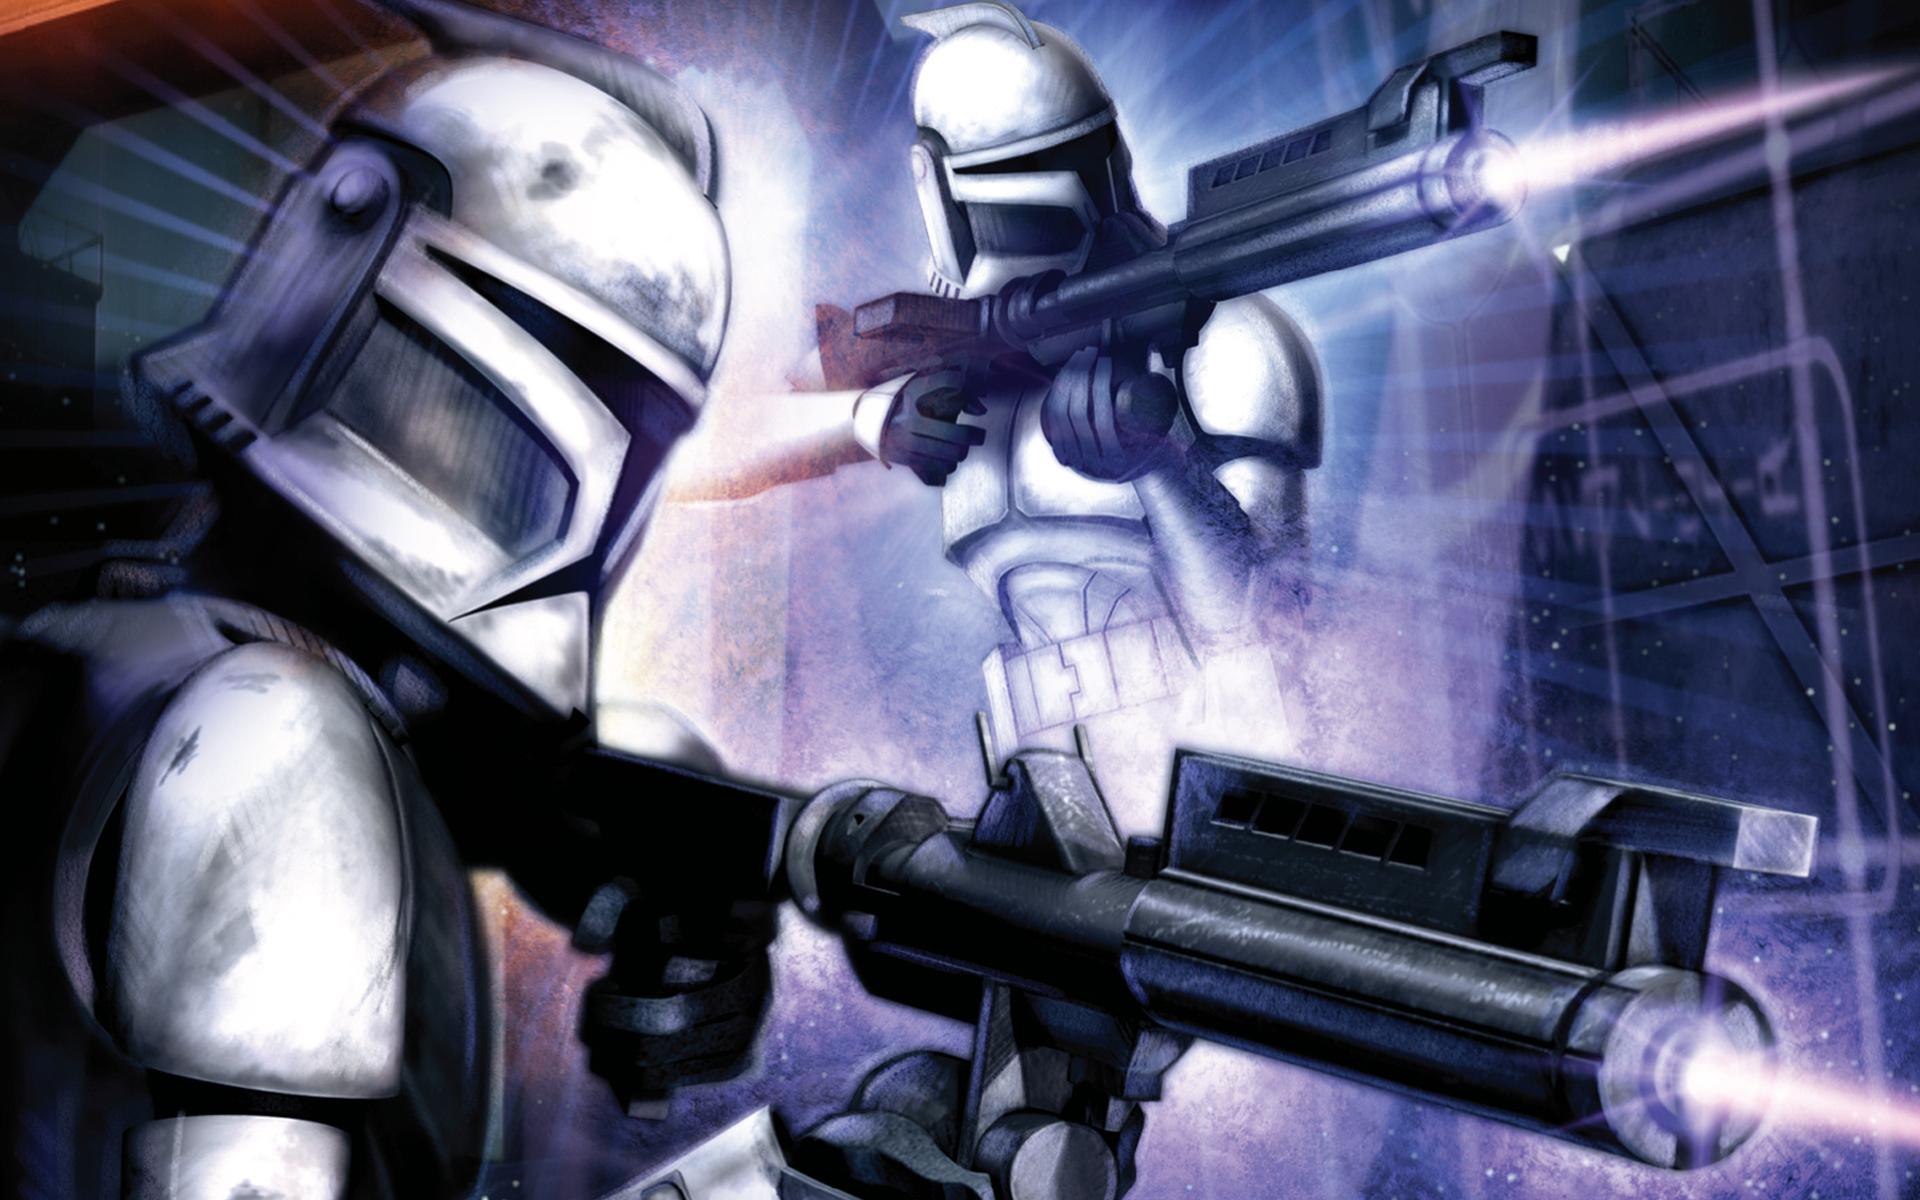 Star wars wallpaper hd 1080p iconos   Taringa 1920x1200